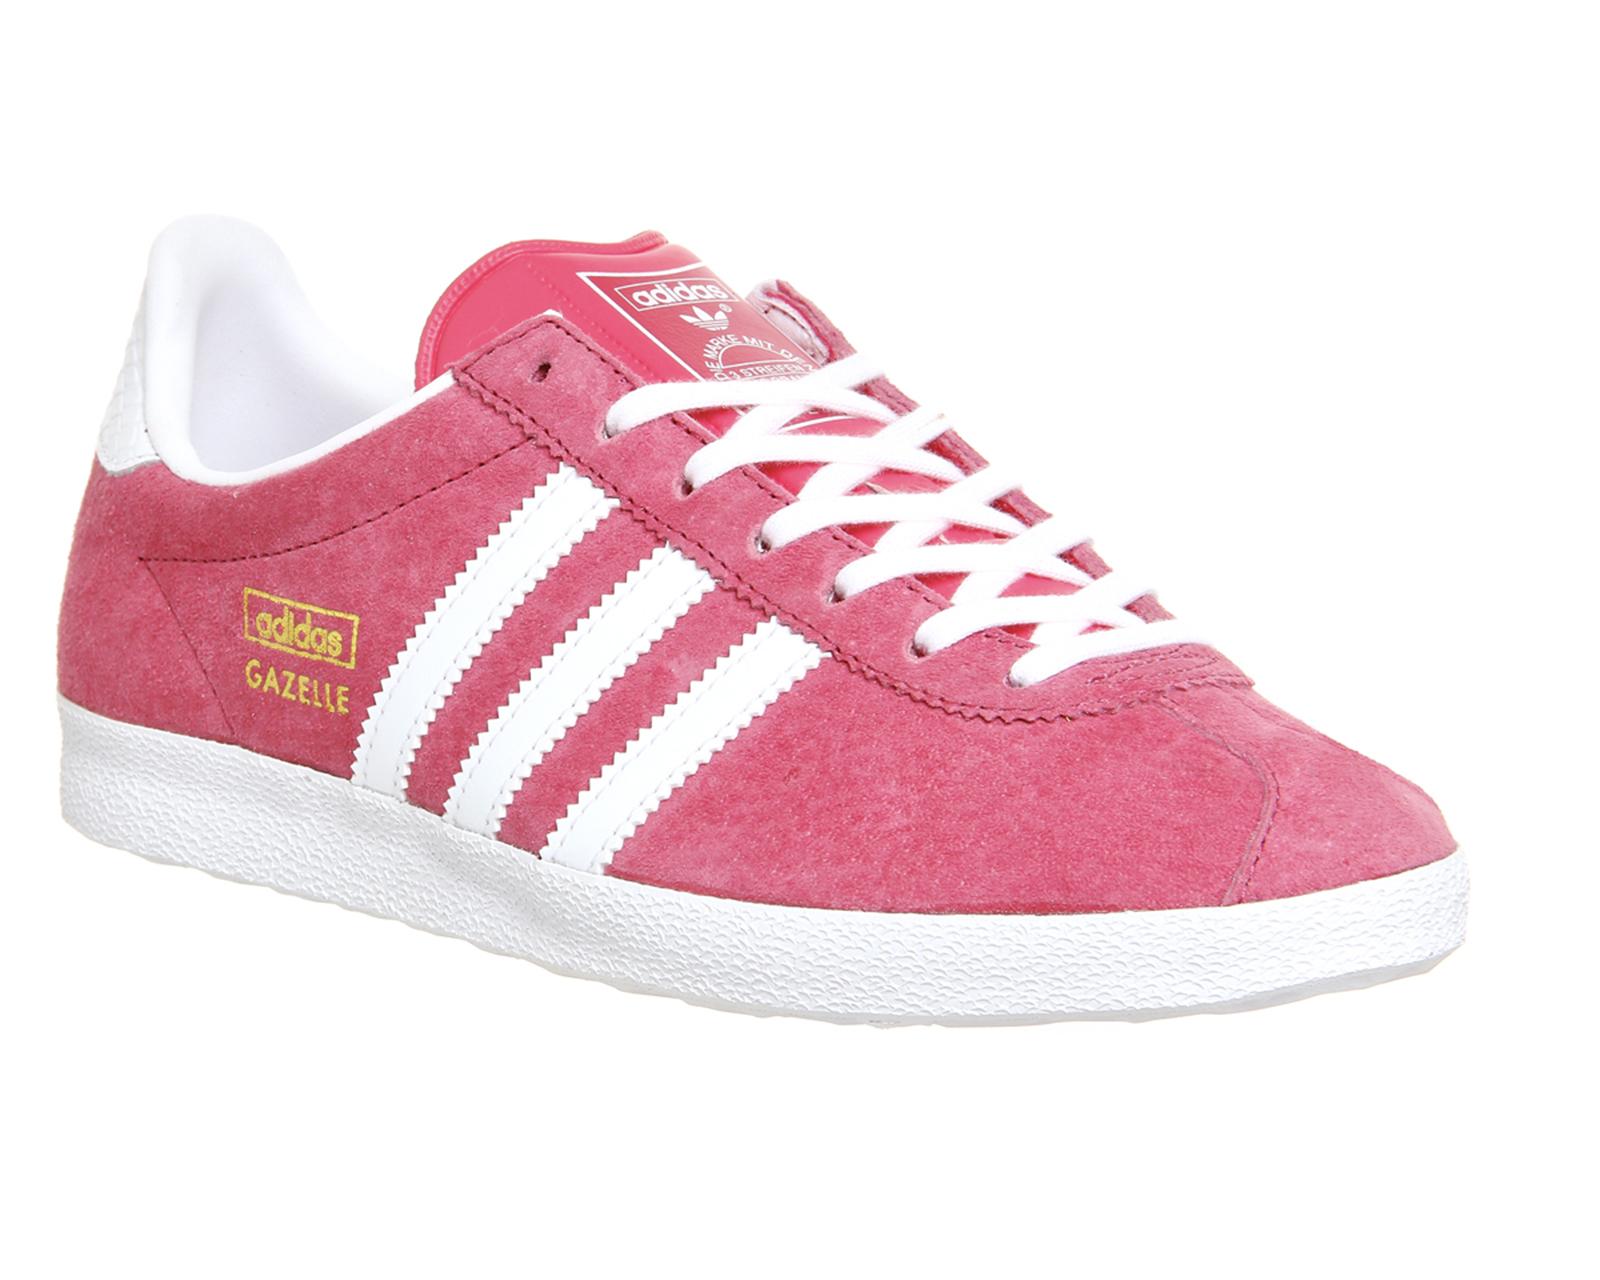 adidas gazelle og lush pink white metallic gold trainers